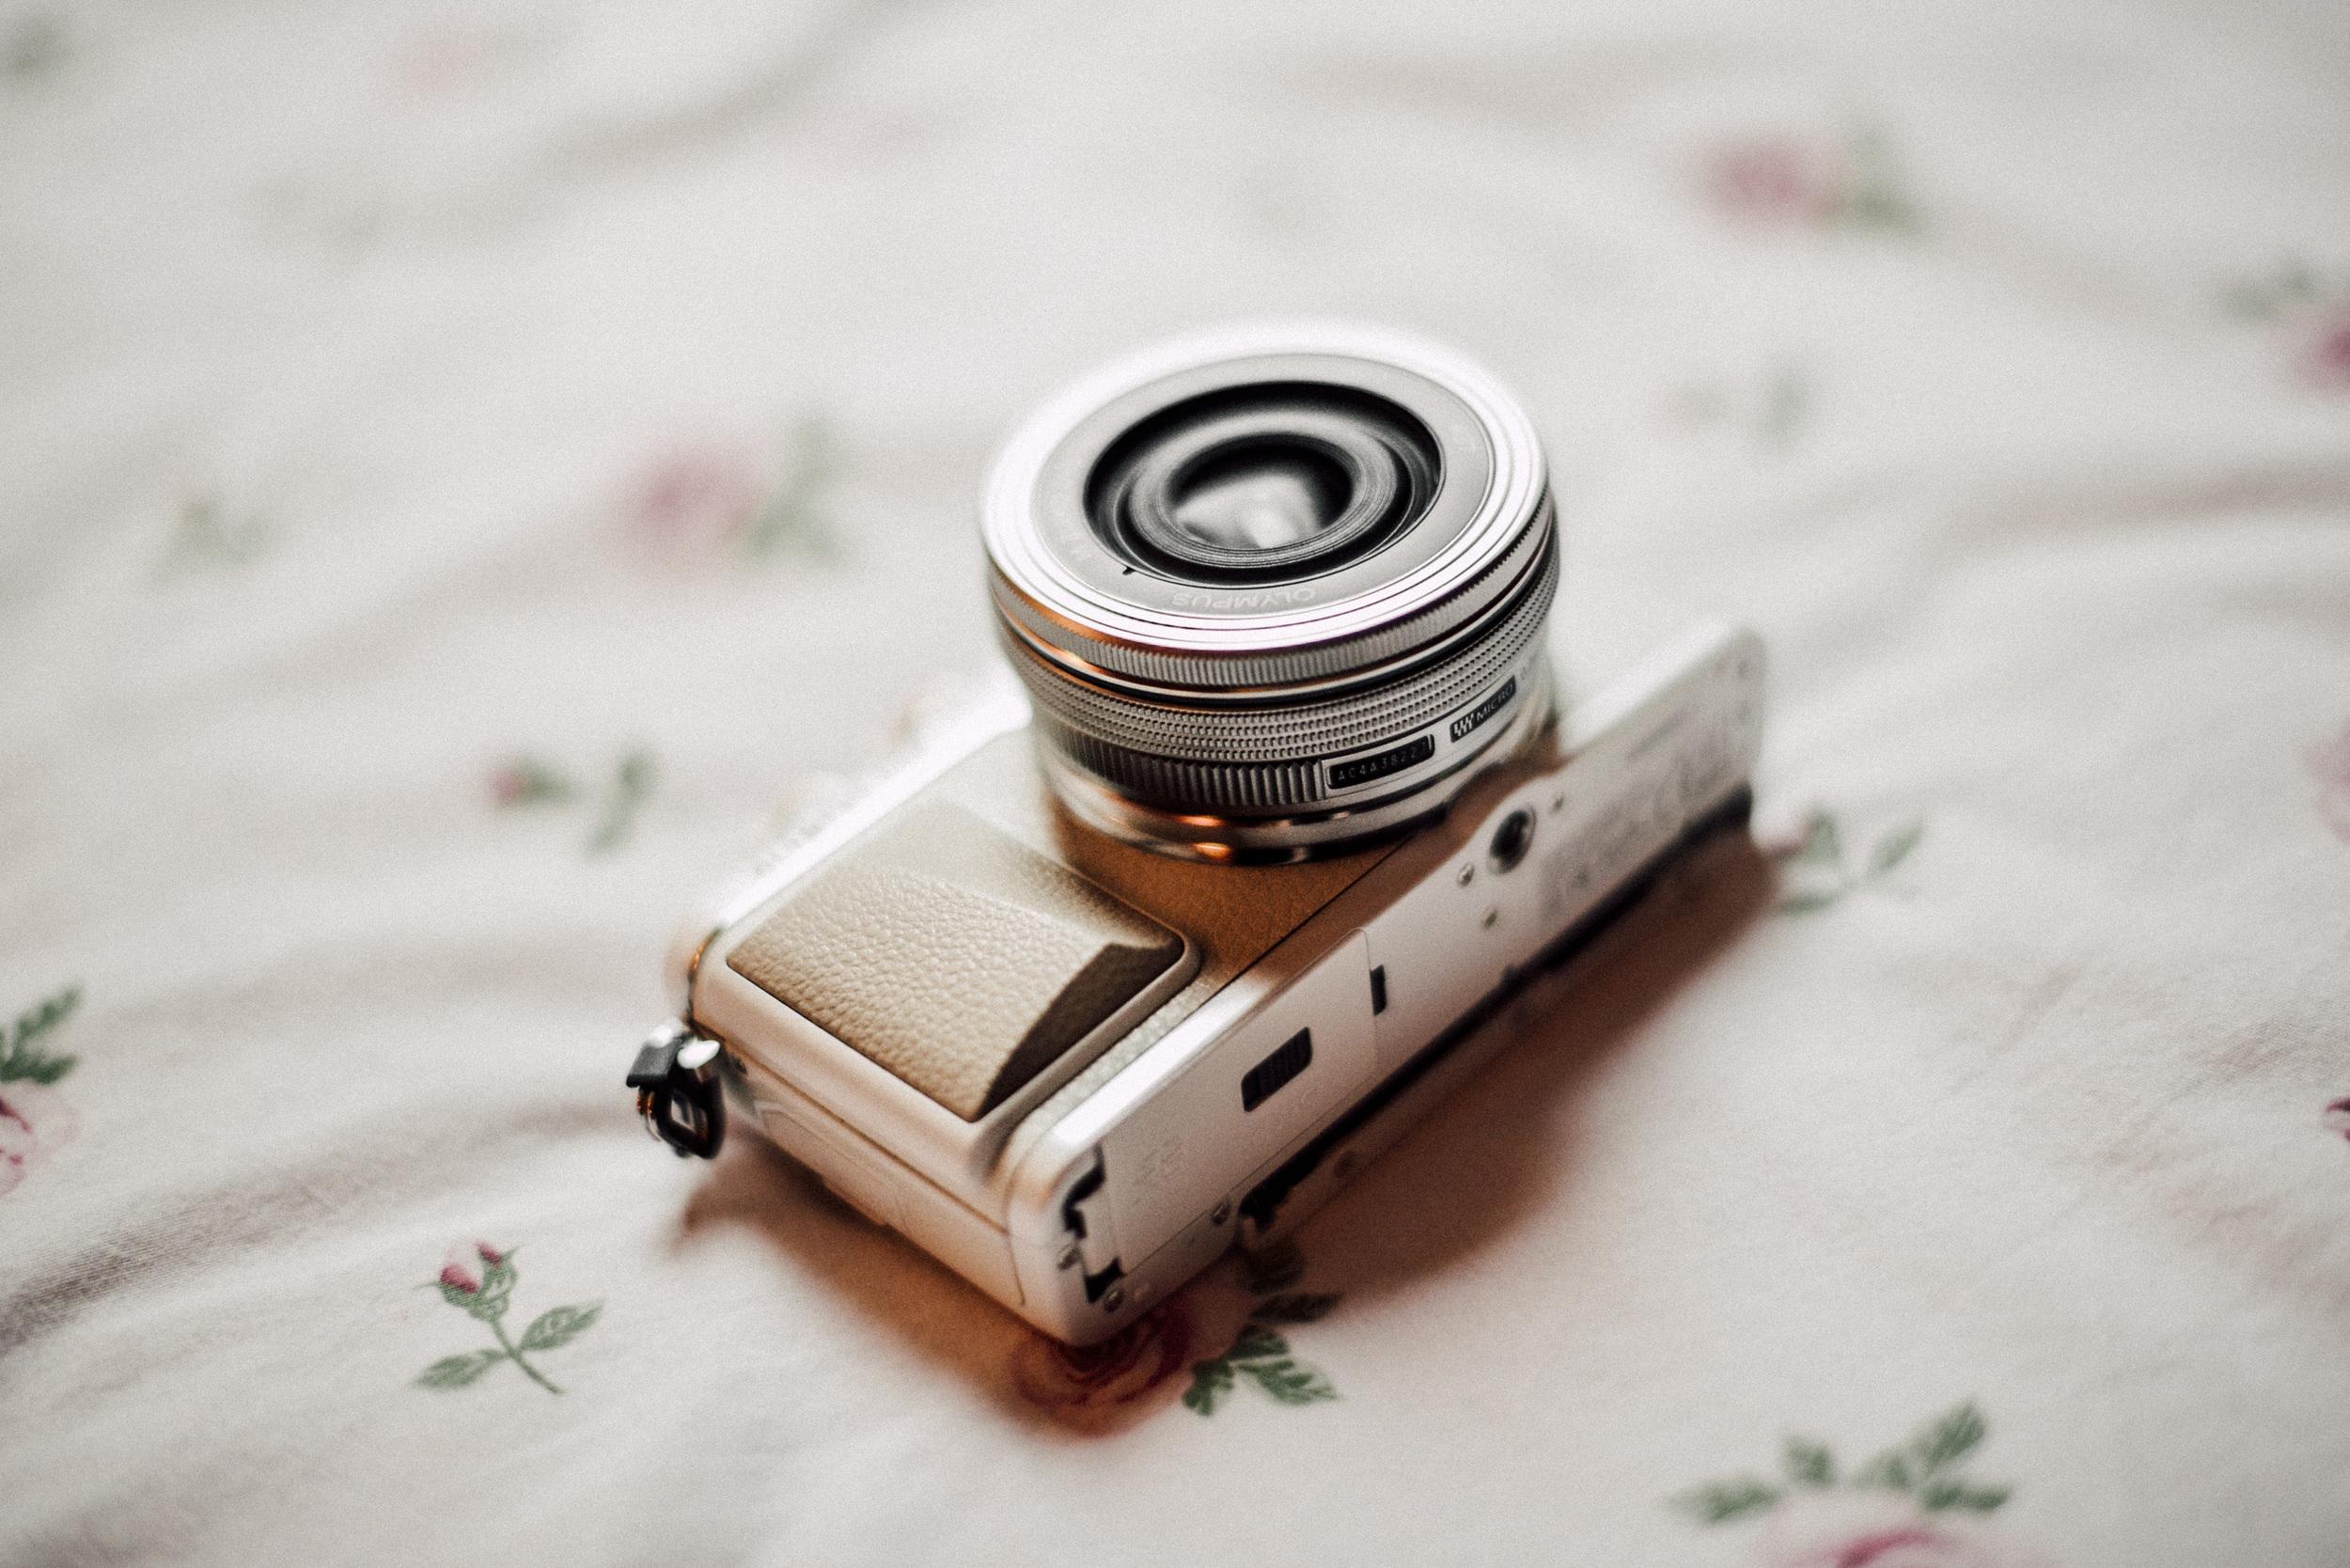 Olympus Pen Generation EPL-7 camera fashion blogger review